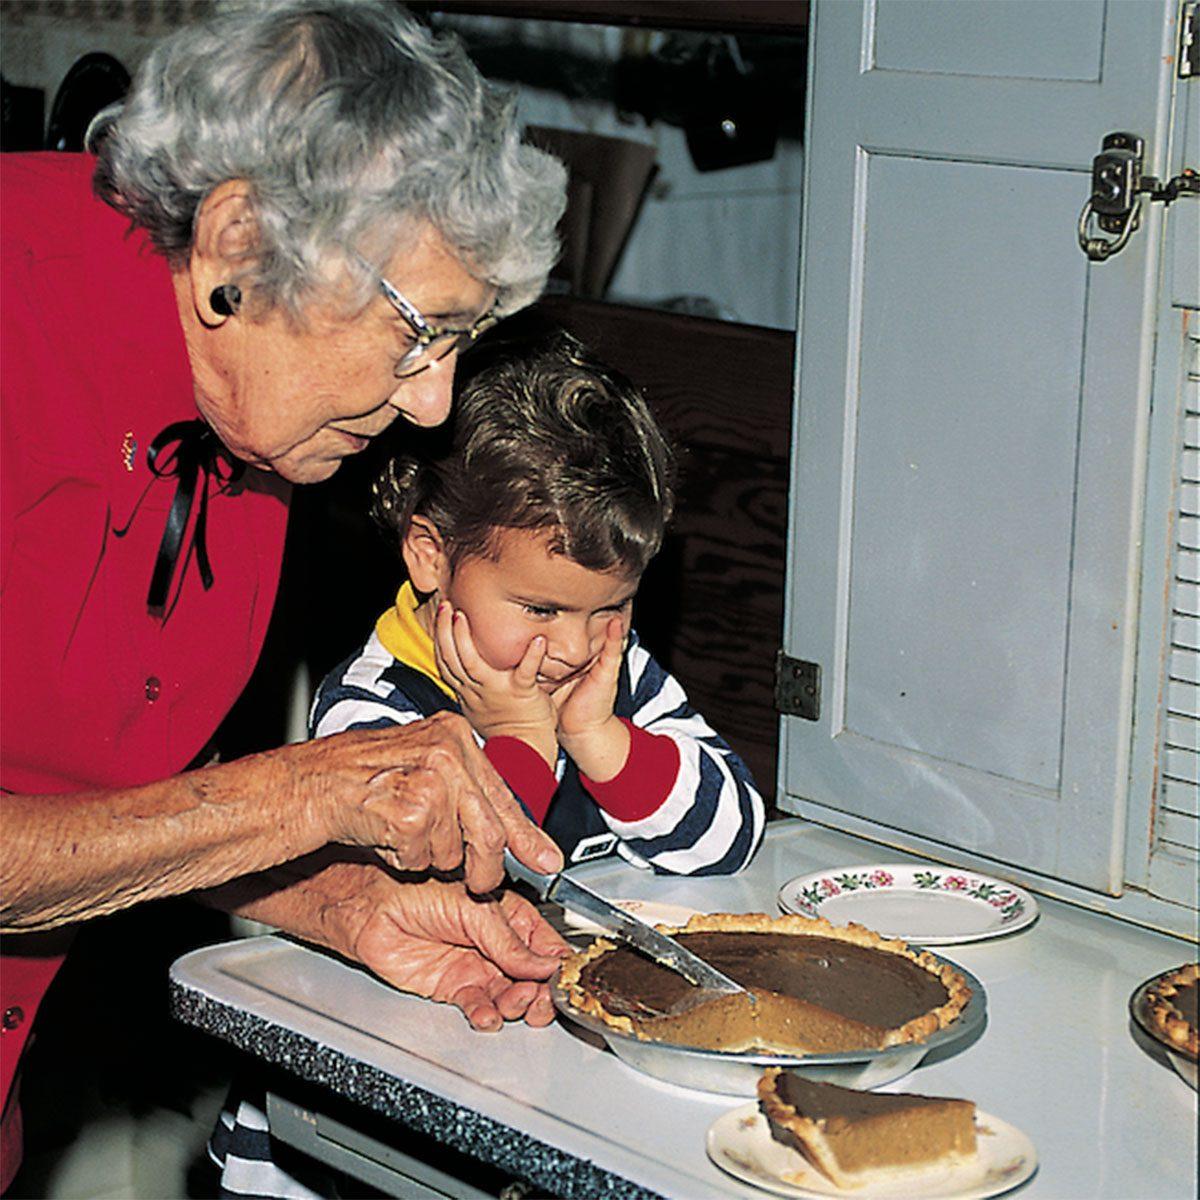 Grandma cutting a slice of pie for her grandchild